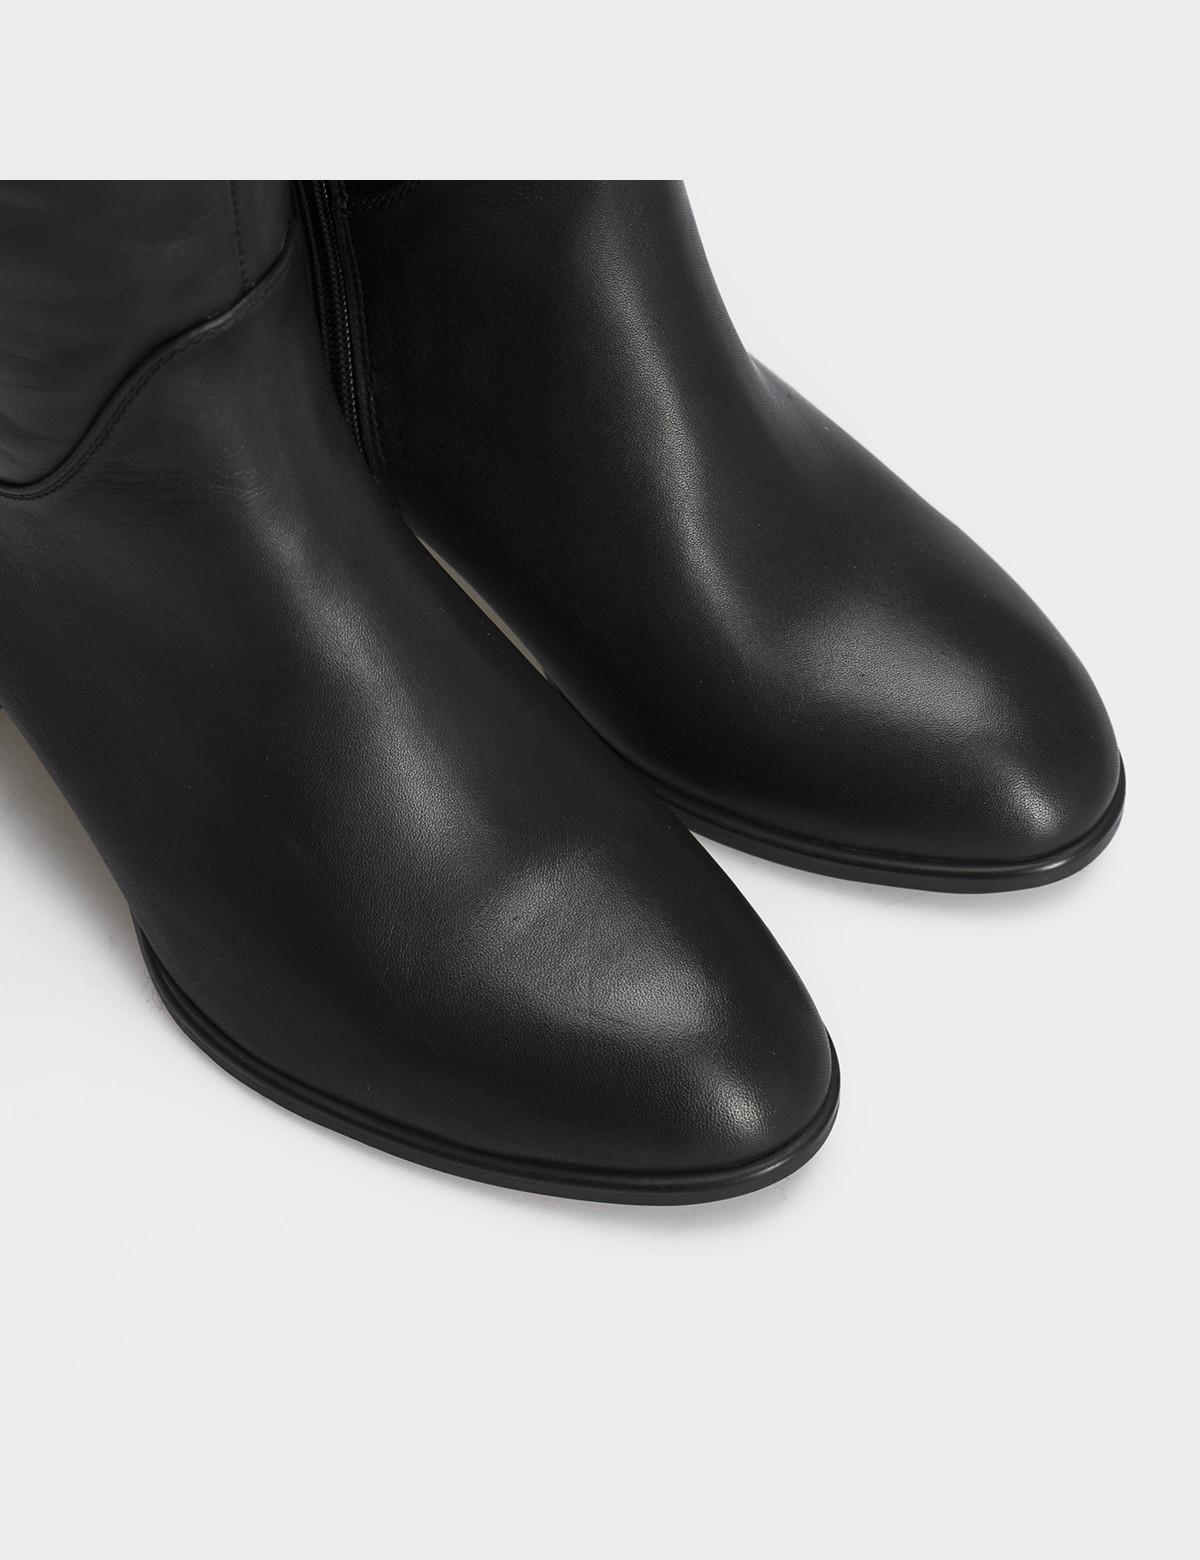 Сапоги черные, натуральная замша/кожа. Байка4